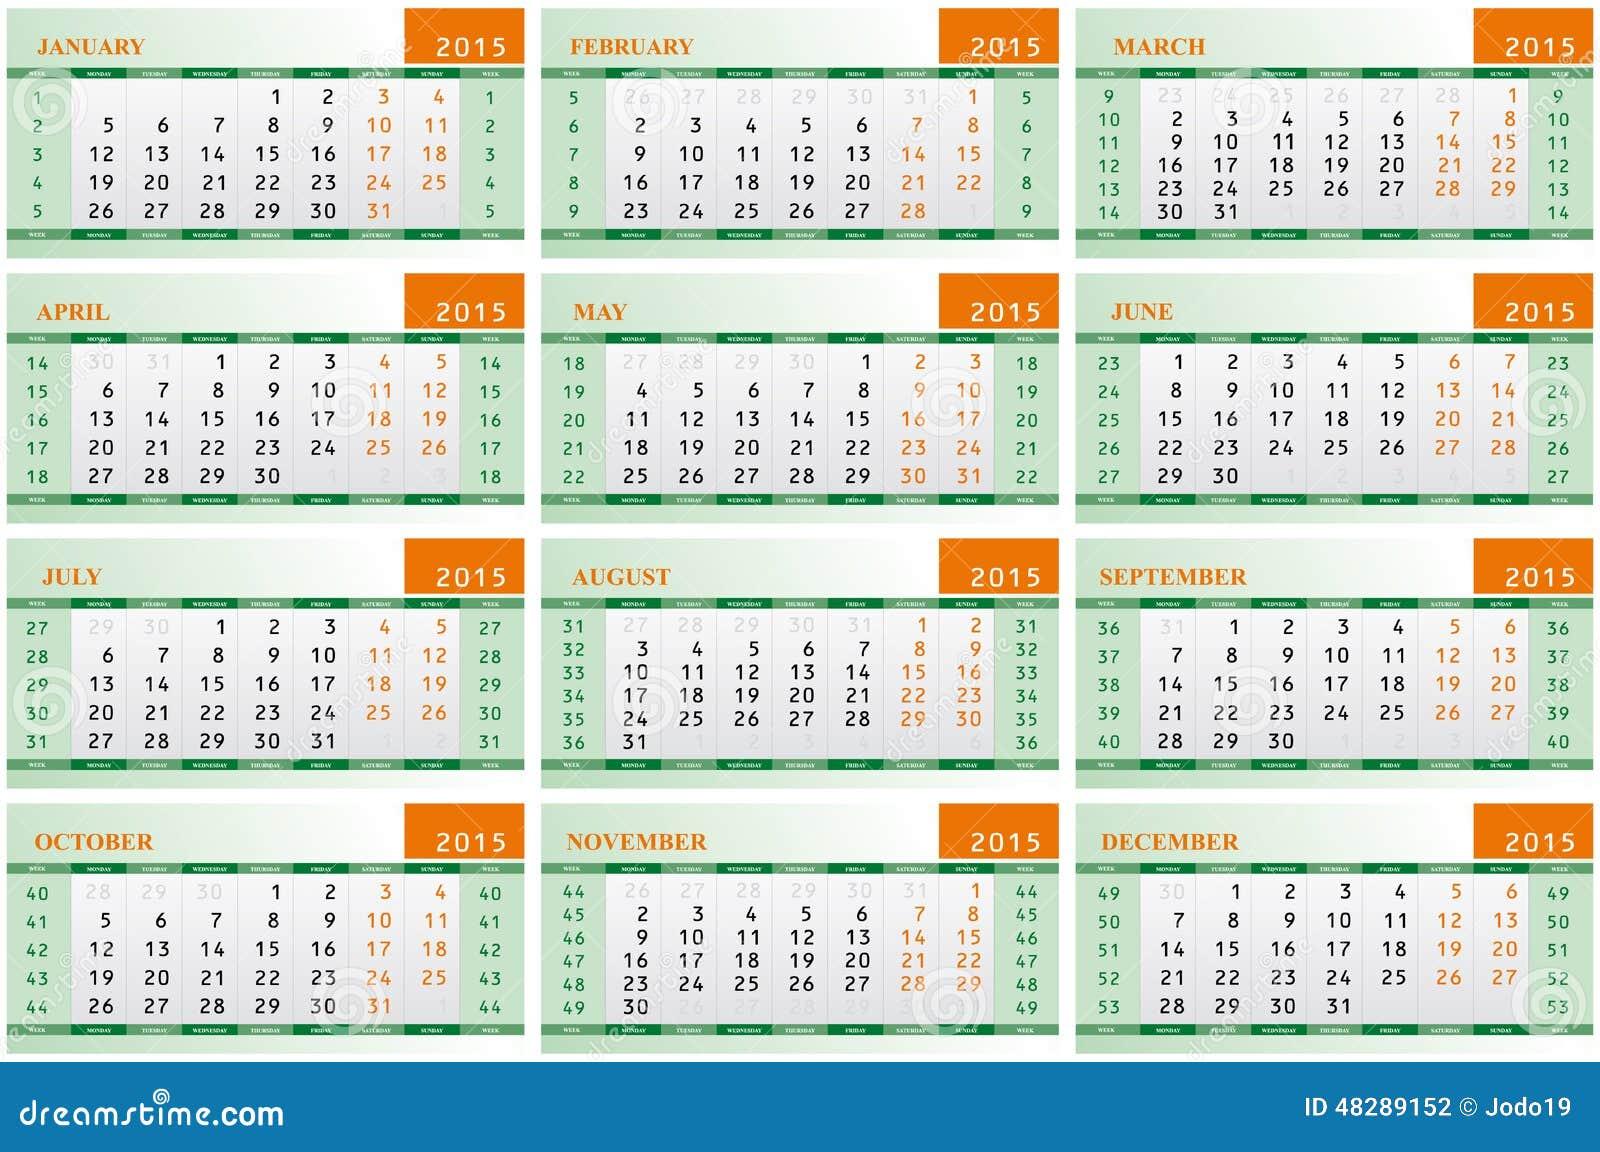 Calendar Picture Ideas For Each Month : Calendar for each month